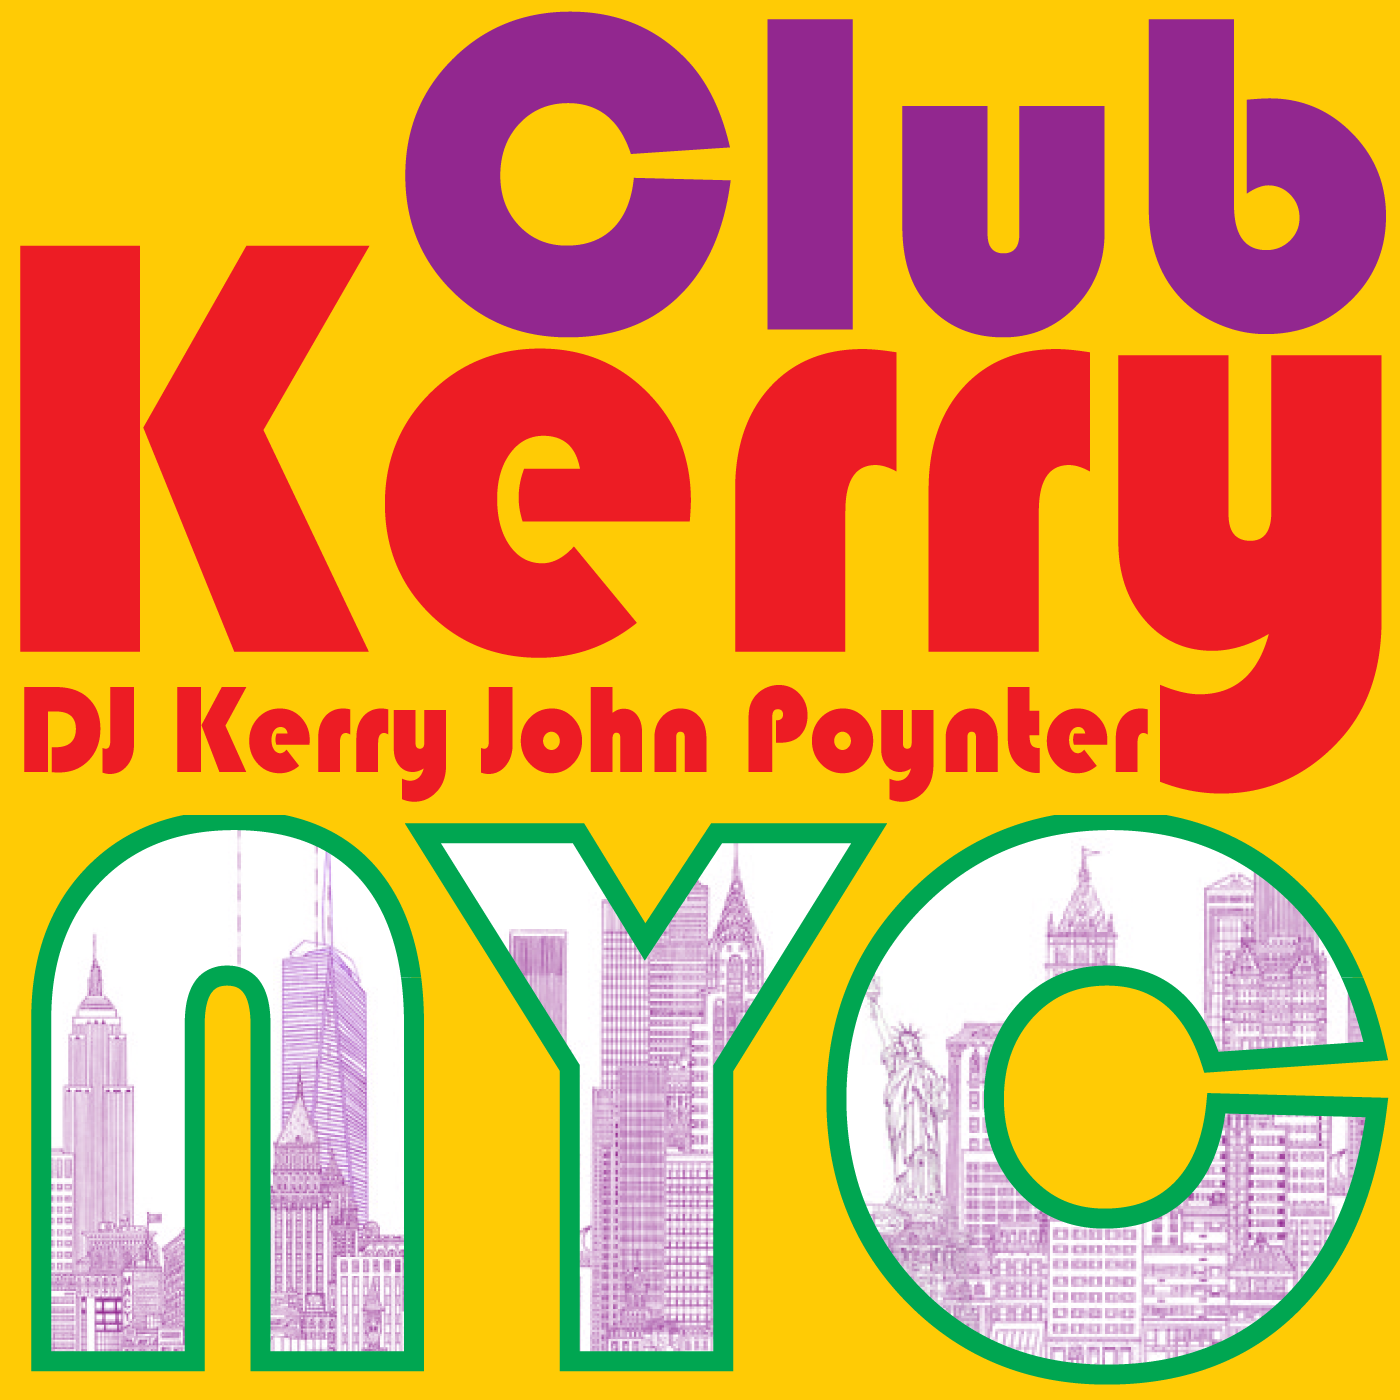 Sunrise After Dark (Feb. 2009) - 12th Anniversary Club Kerry NYC Podcast show art